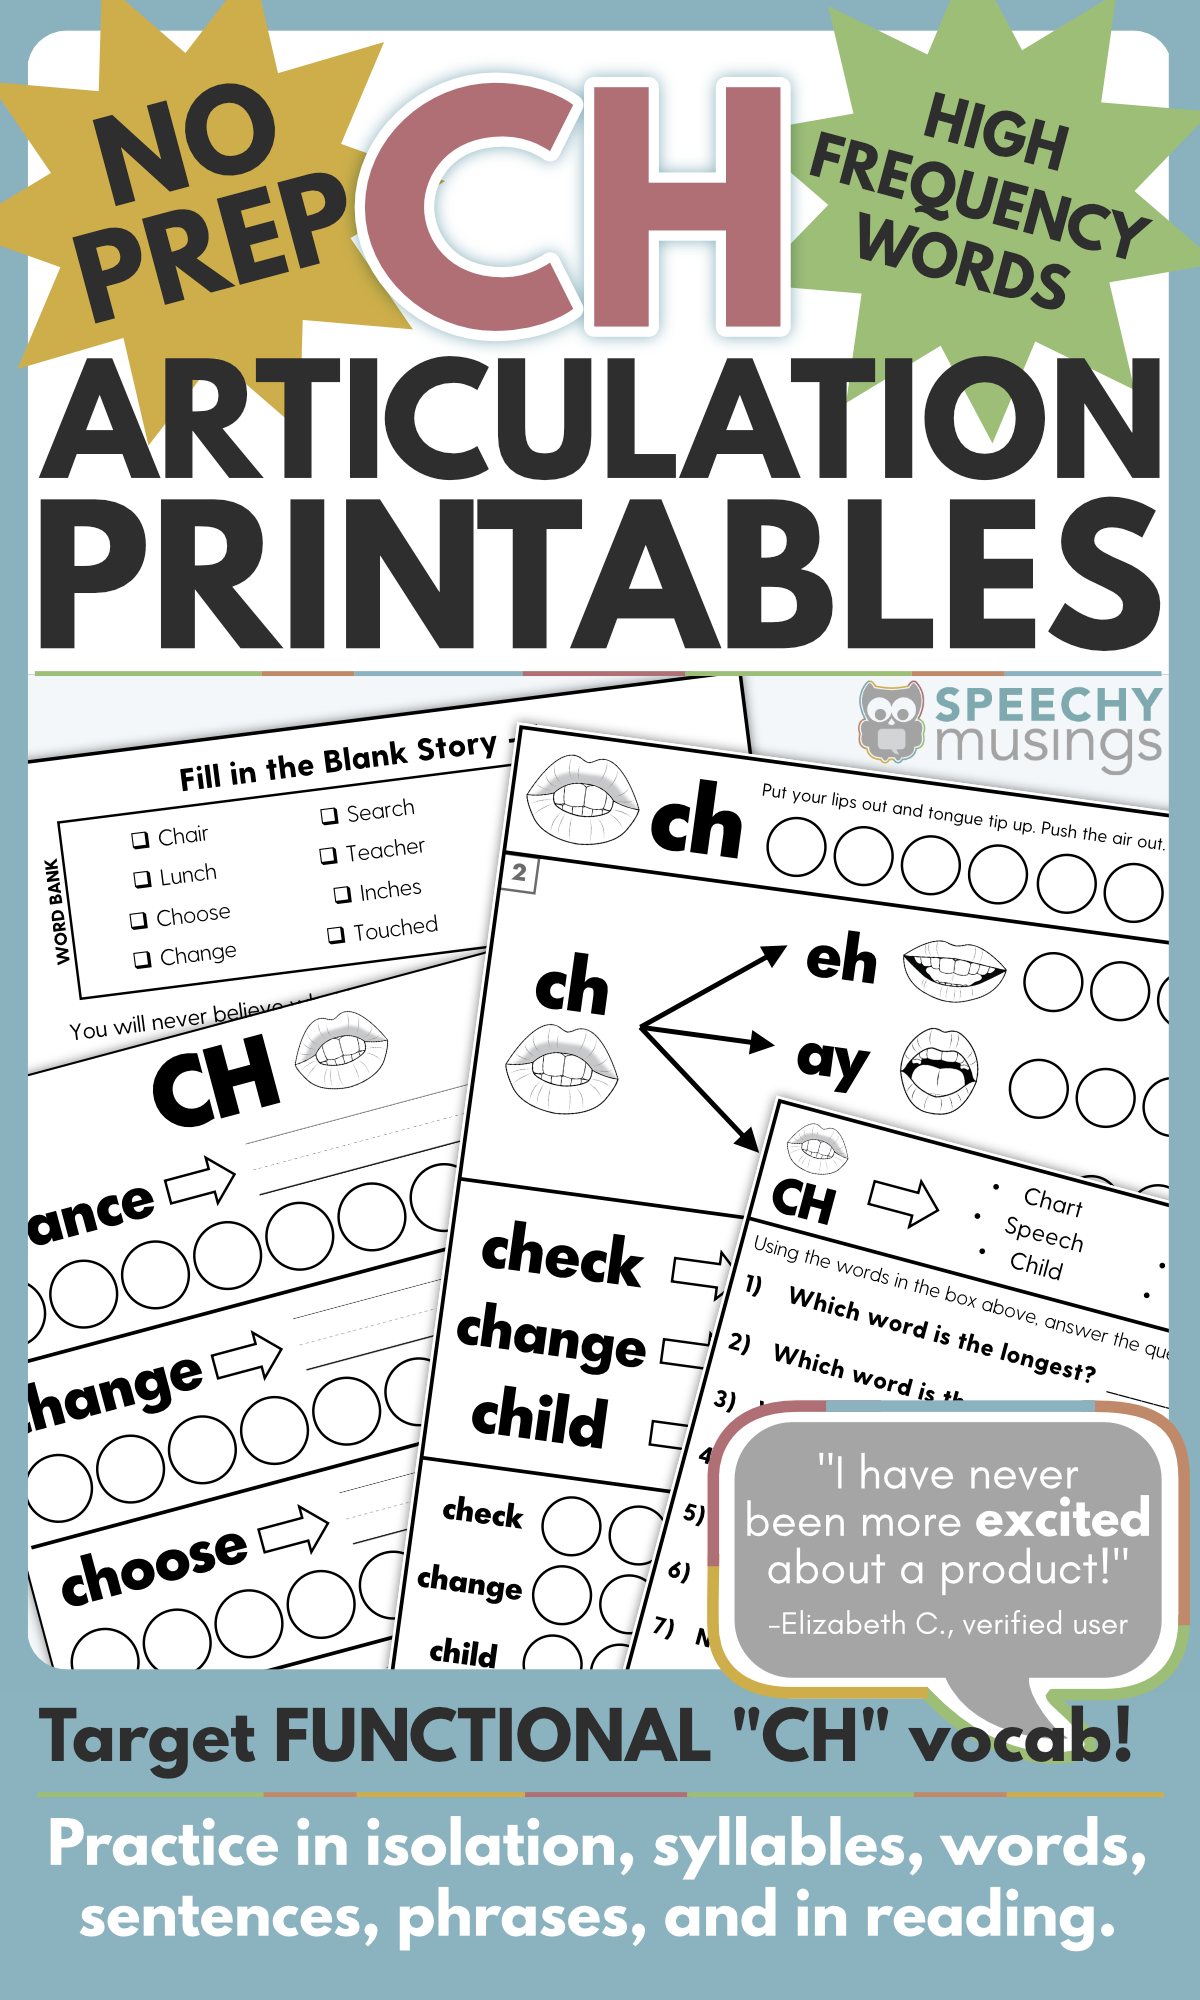 No Prep Articulation Printables Using Functional High